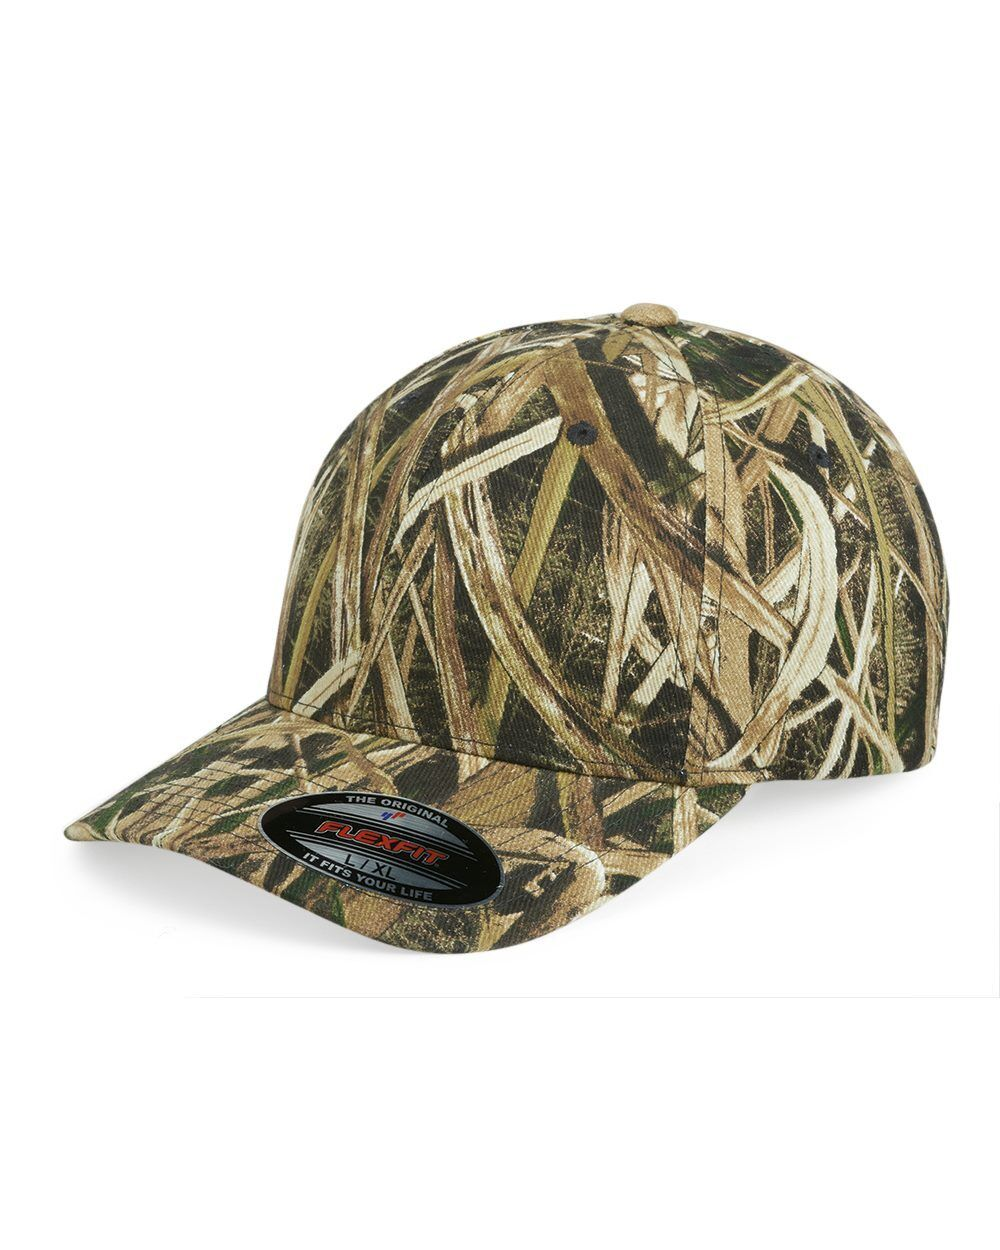 FLEXFIT Mossy Oak Infinity Camo Hats NEW Fitted Camouflage Cap SM LXL 2XL 6999  eBay